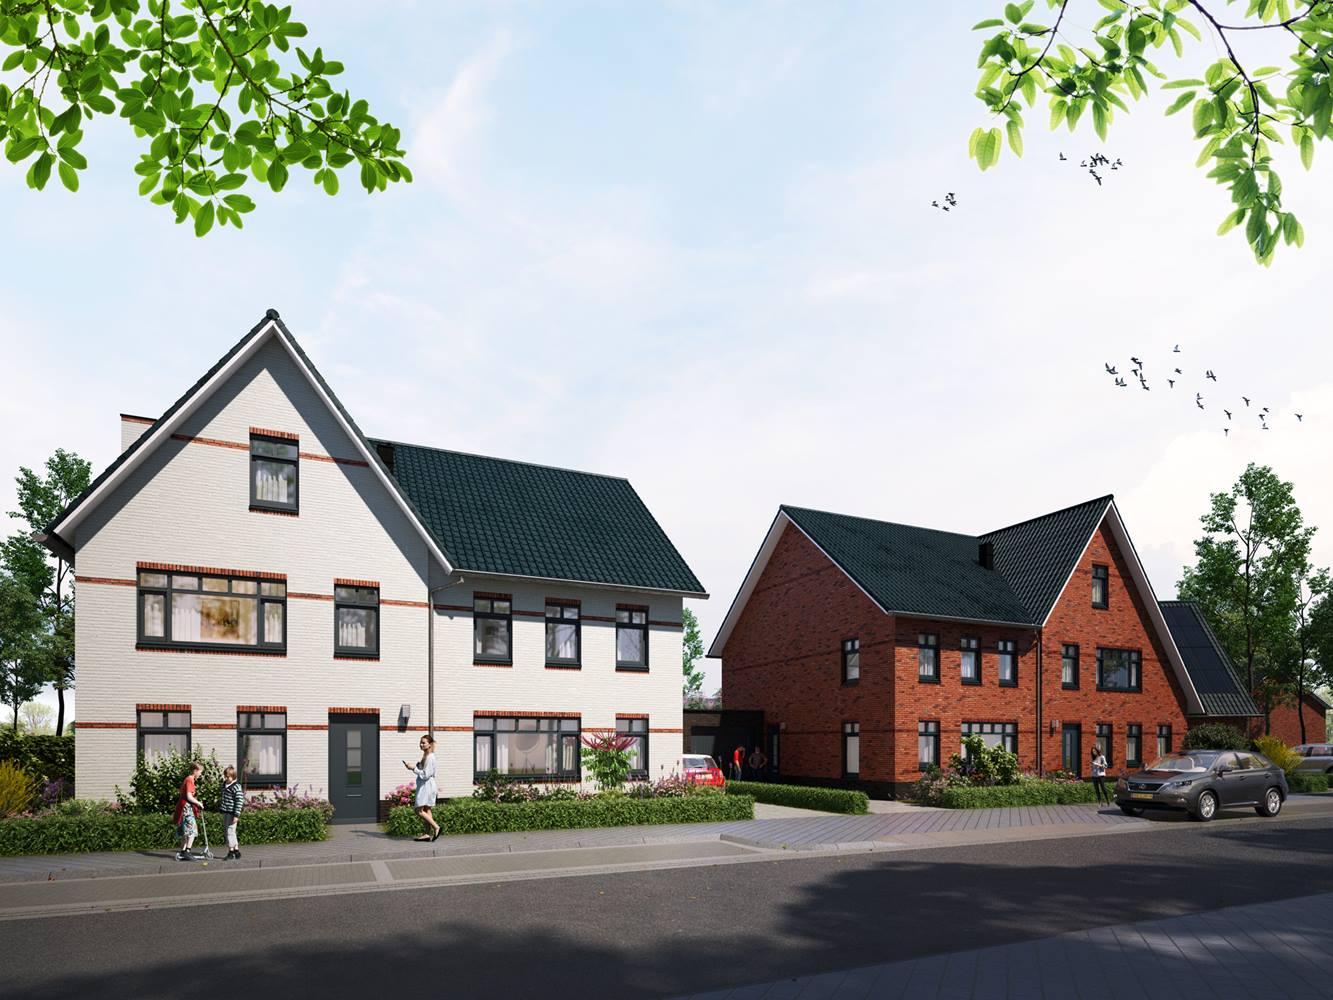 Huissens Hoogh fase 2: nog enkele woningen beschikbaar!